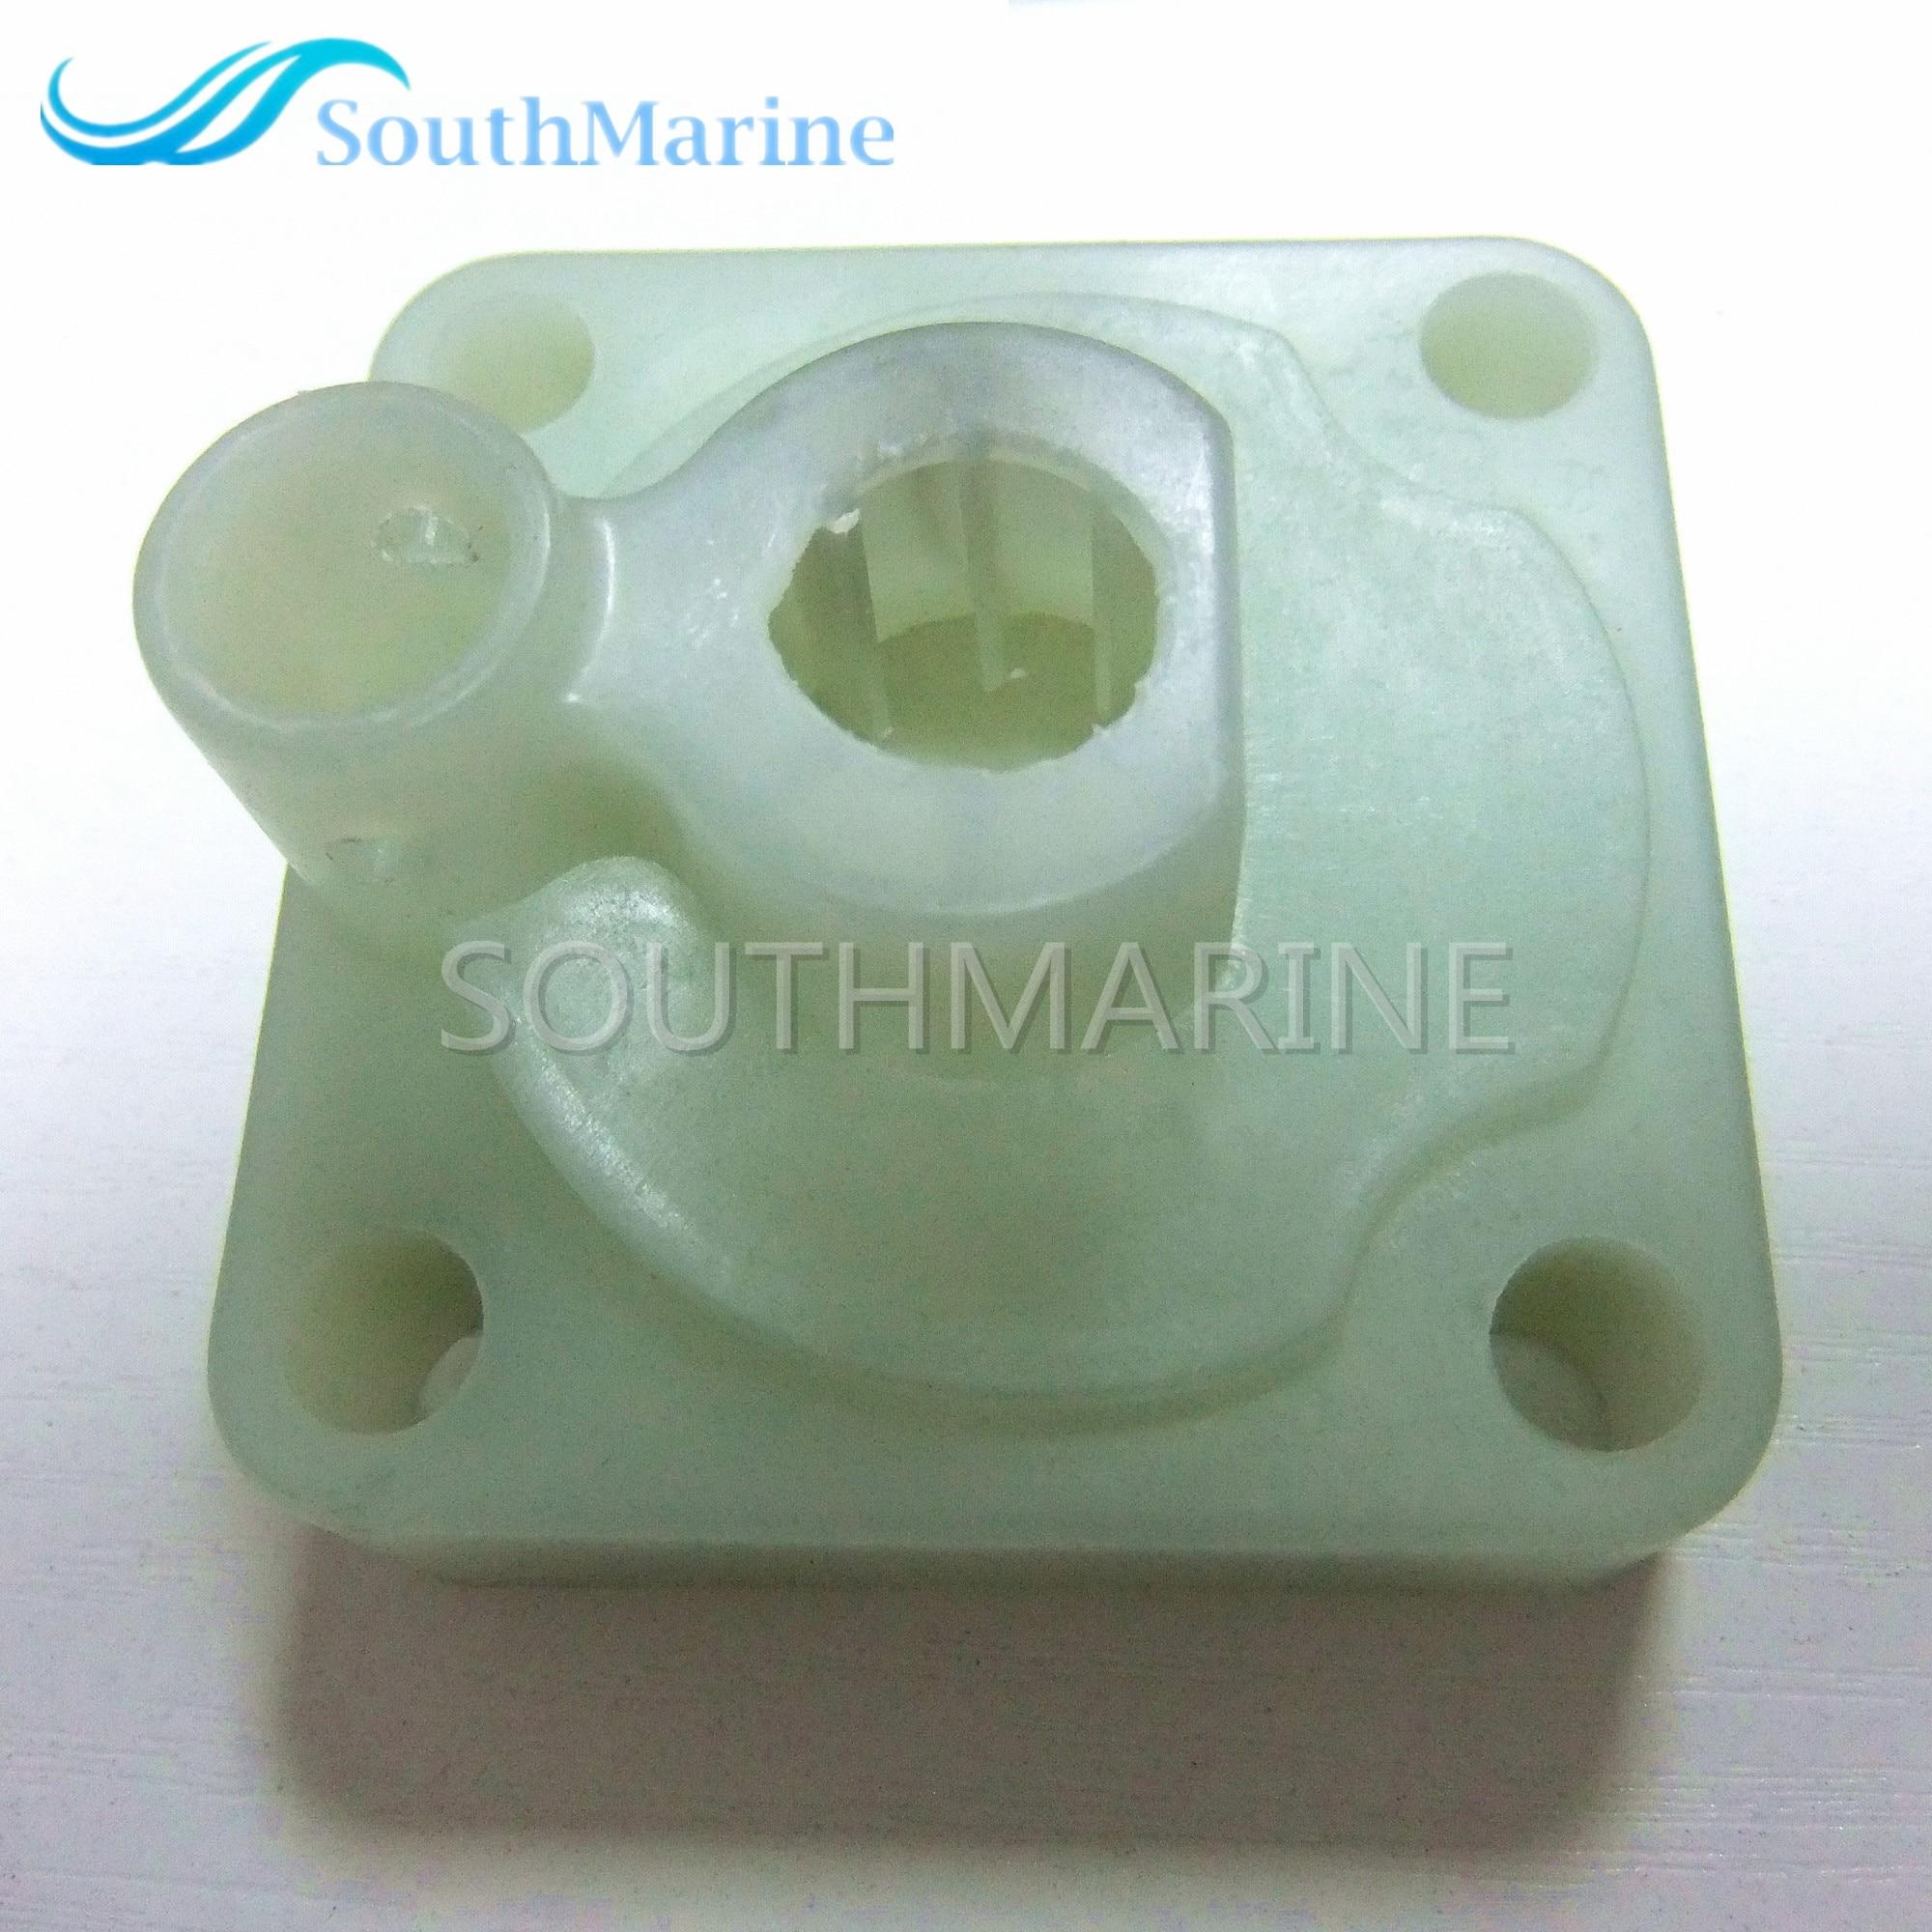 Water pump housing 63V for Yamaha 9.9hp 15hp outboard motor 63V-44301-00